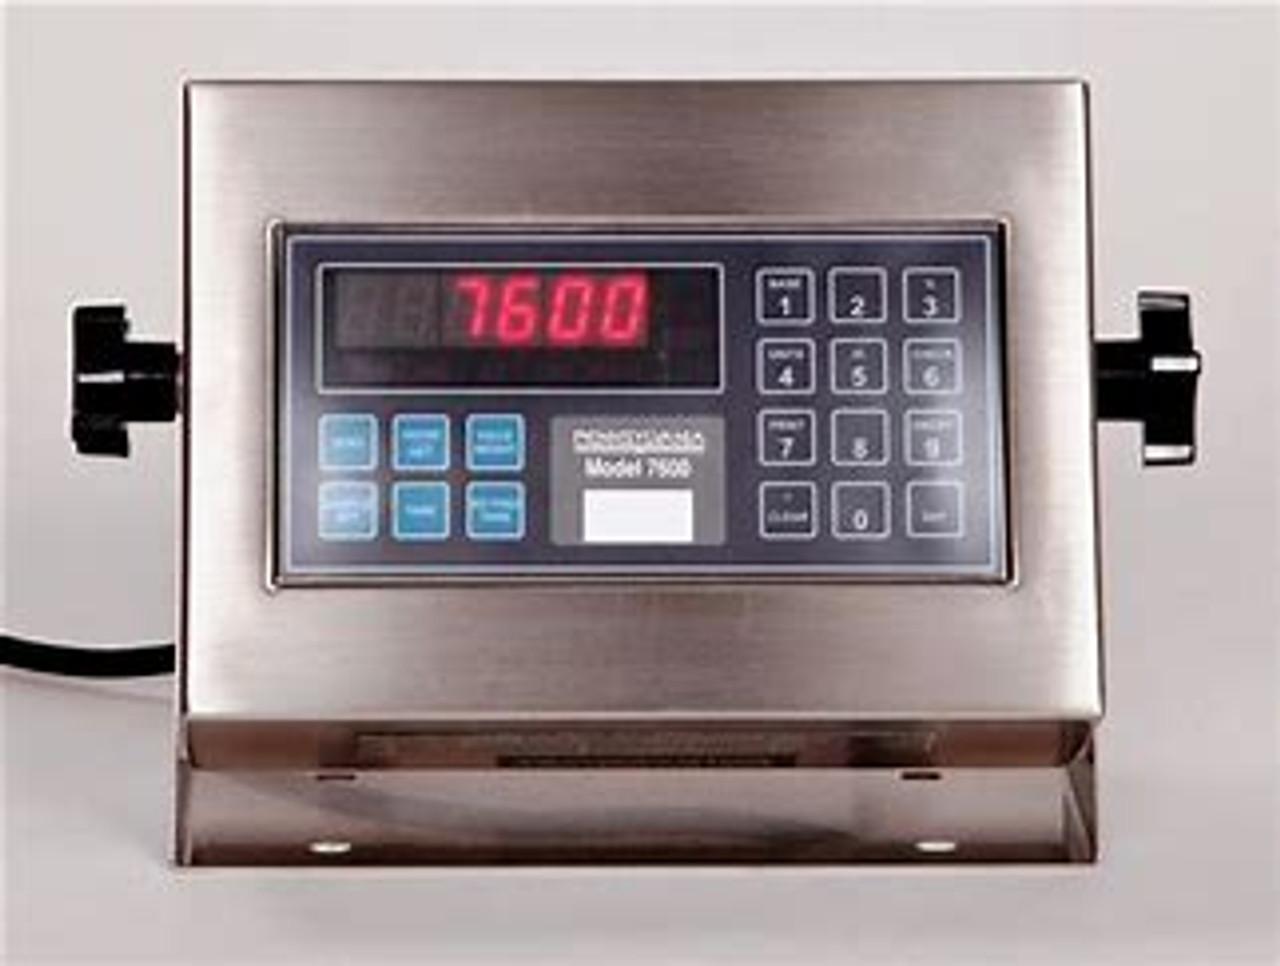 Pennsylvania 6600 Floor Scale with 7600 Indicator